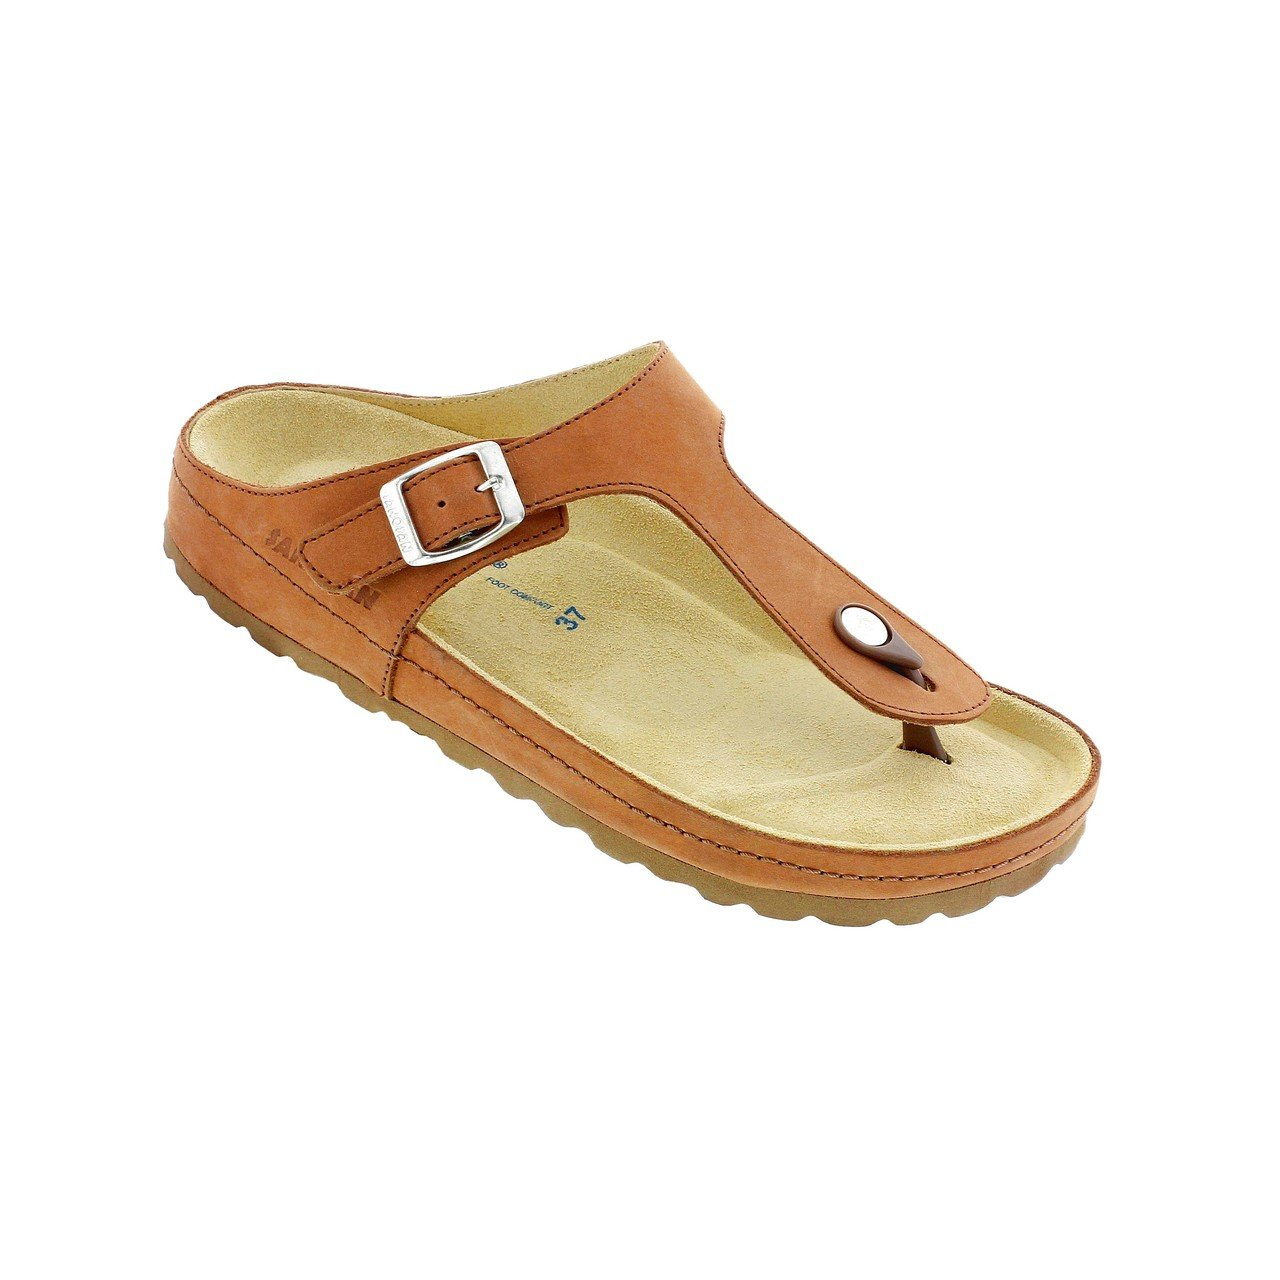 Comfort Plus Sanosan Womens Georgia Thong Sandals in Nubuck Leather